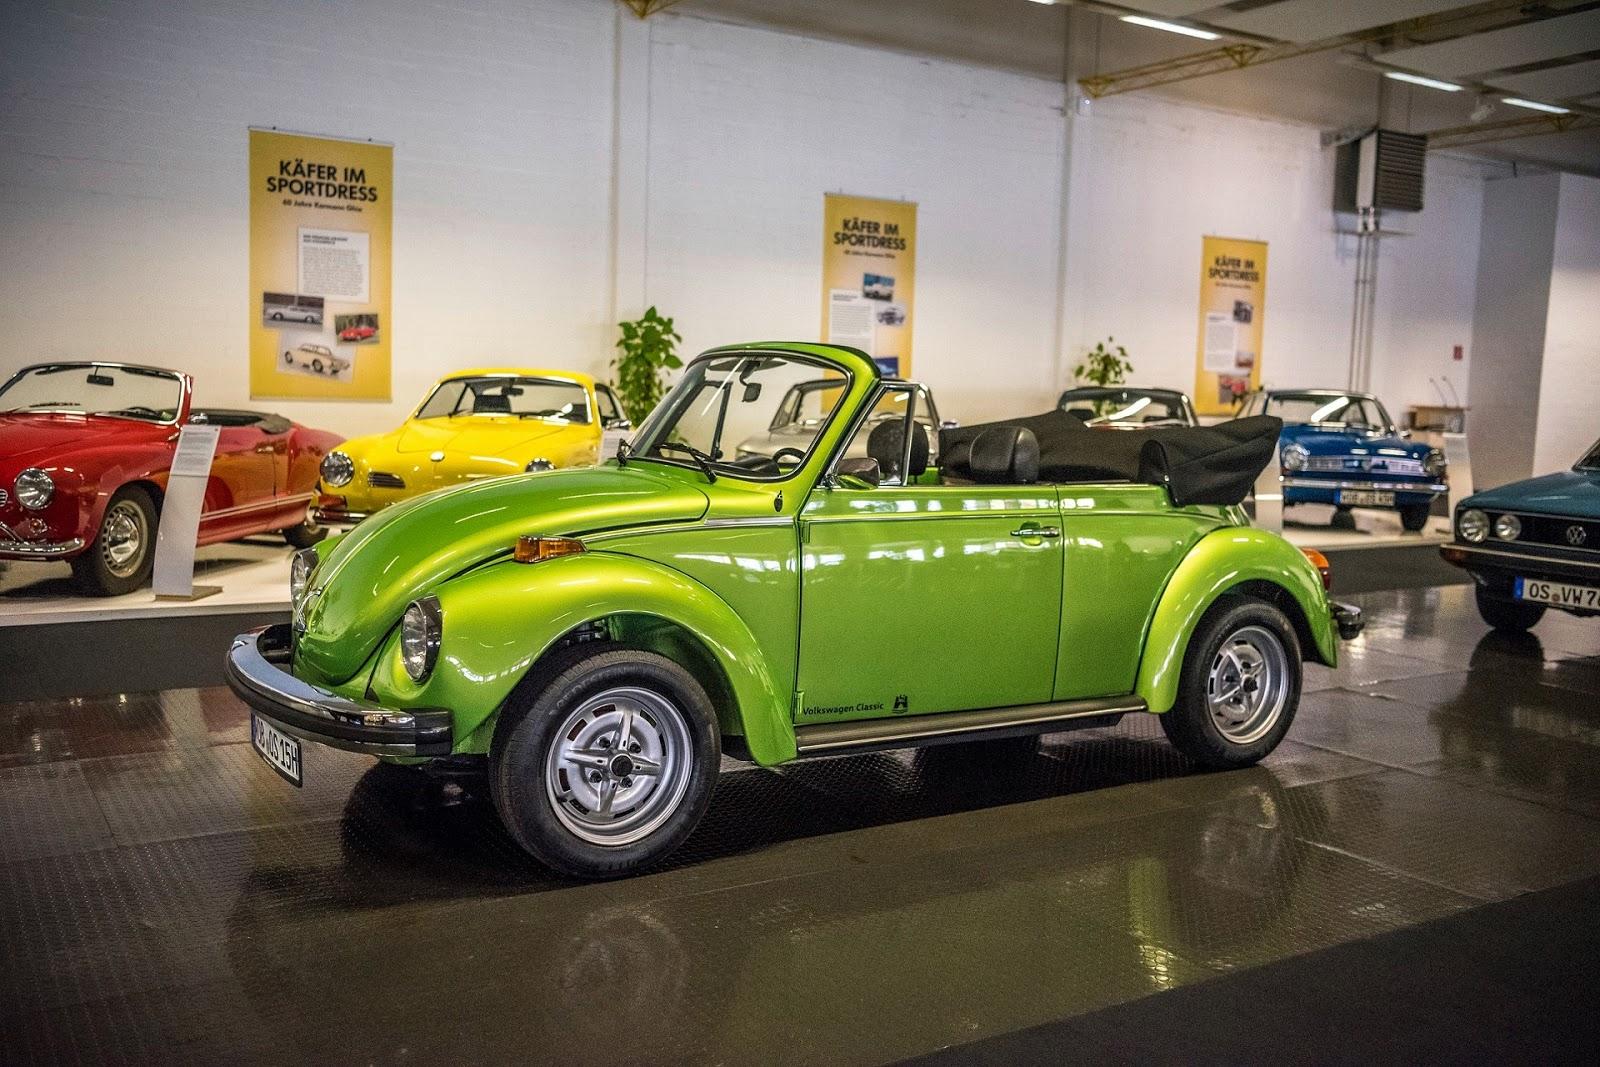 VOLKSWAGEN2BBEETLE2BCABRIOLET Το VW T-Roc Cabrio παράγεται εκεί που φτιαχνόταν το Beetle Cabriolet cabrio, Volkswagen, Volkswagen Golf, VW, VW Beetle